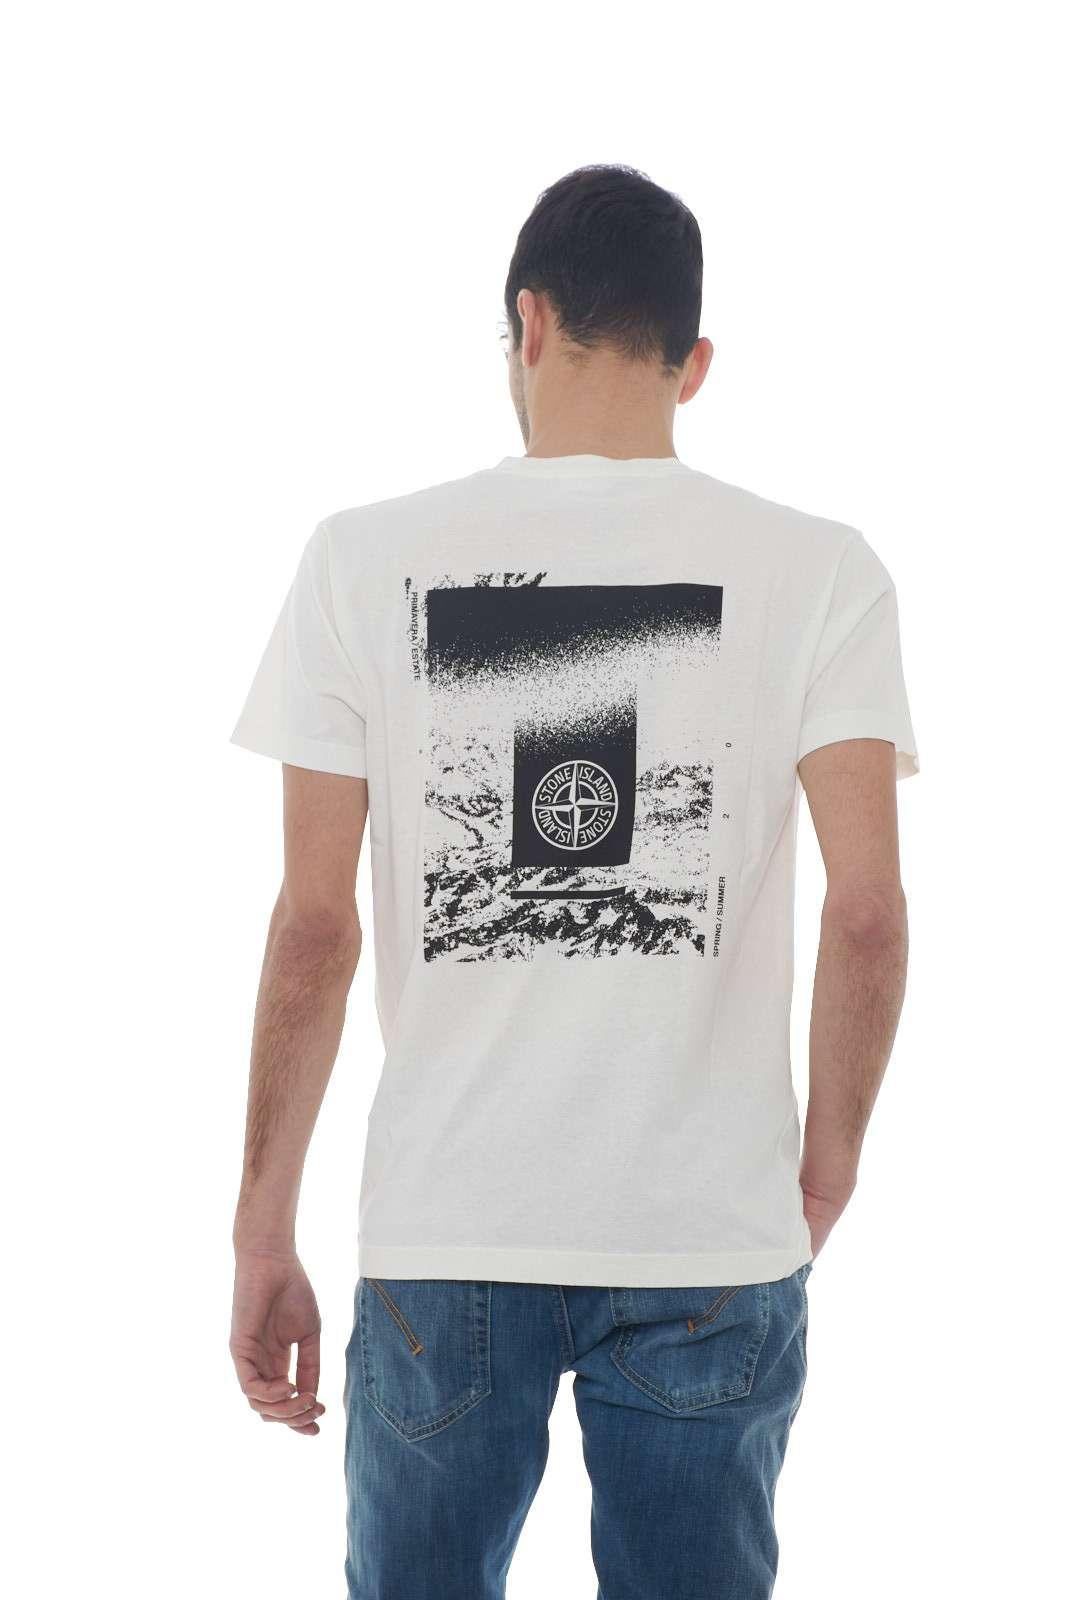 https://www.parmax.com/media/catalog/product/a/i/PE-outlet_parmax-t-shirt-uomo-Stone-Island-72152ns84-C.jpg